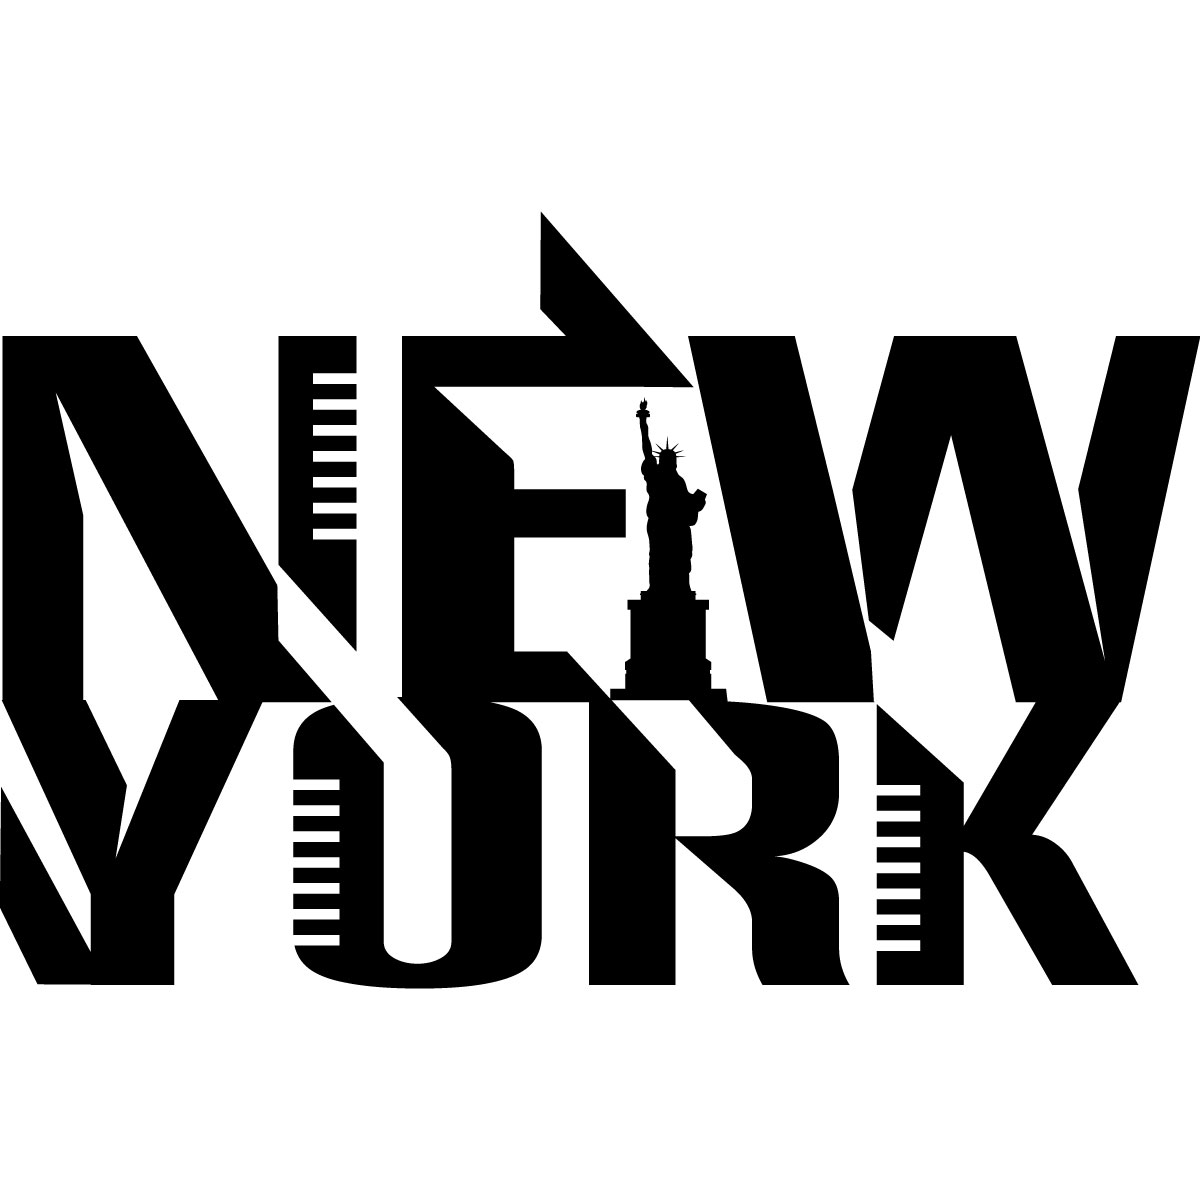 stickers muraux pays et villes sticker logo de new york ambiance. Black Bedroom Furniture Sets. Home Design Ideas